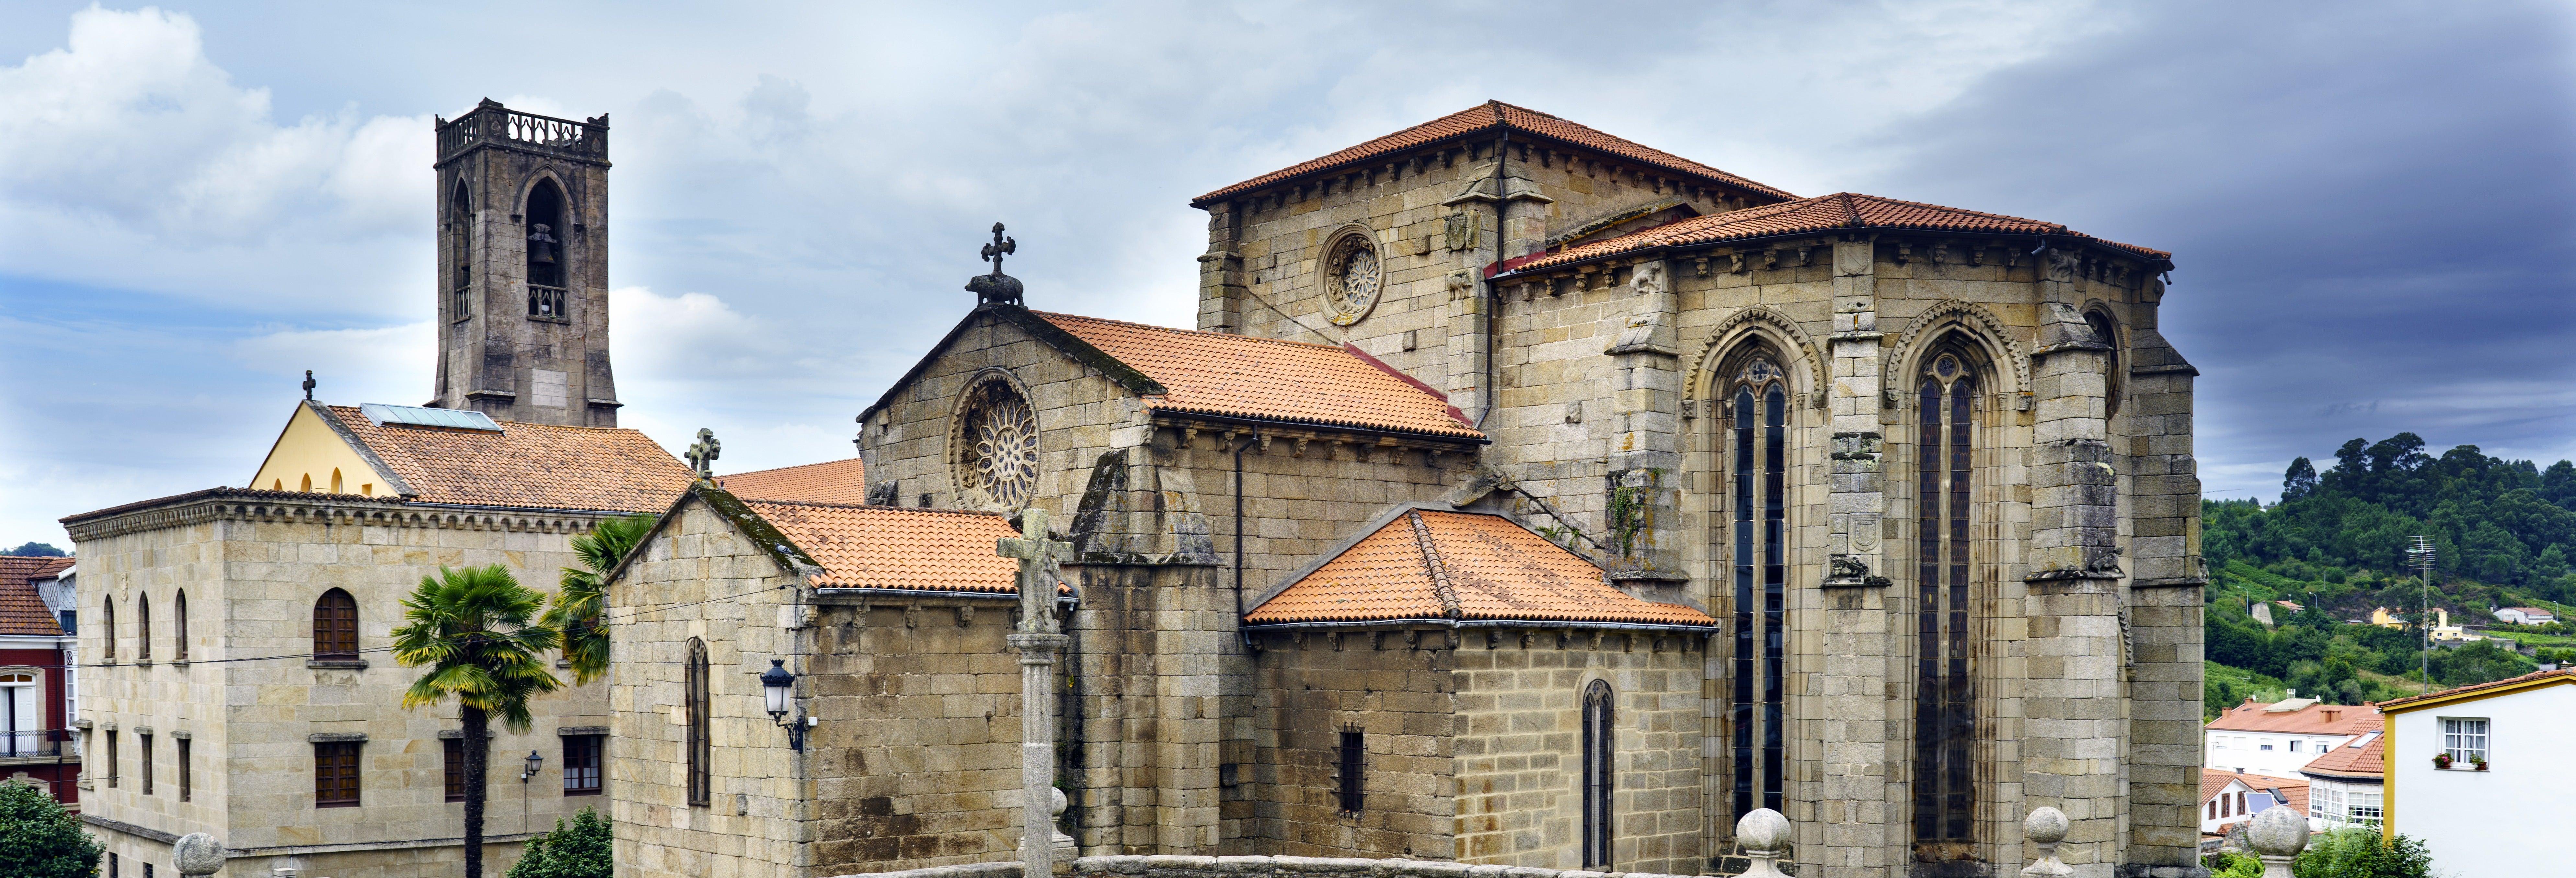 Excursão a La Coruña e Betanzos